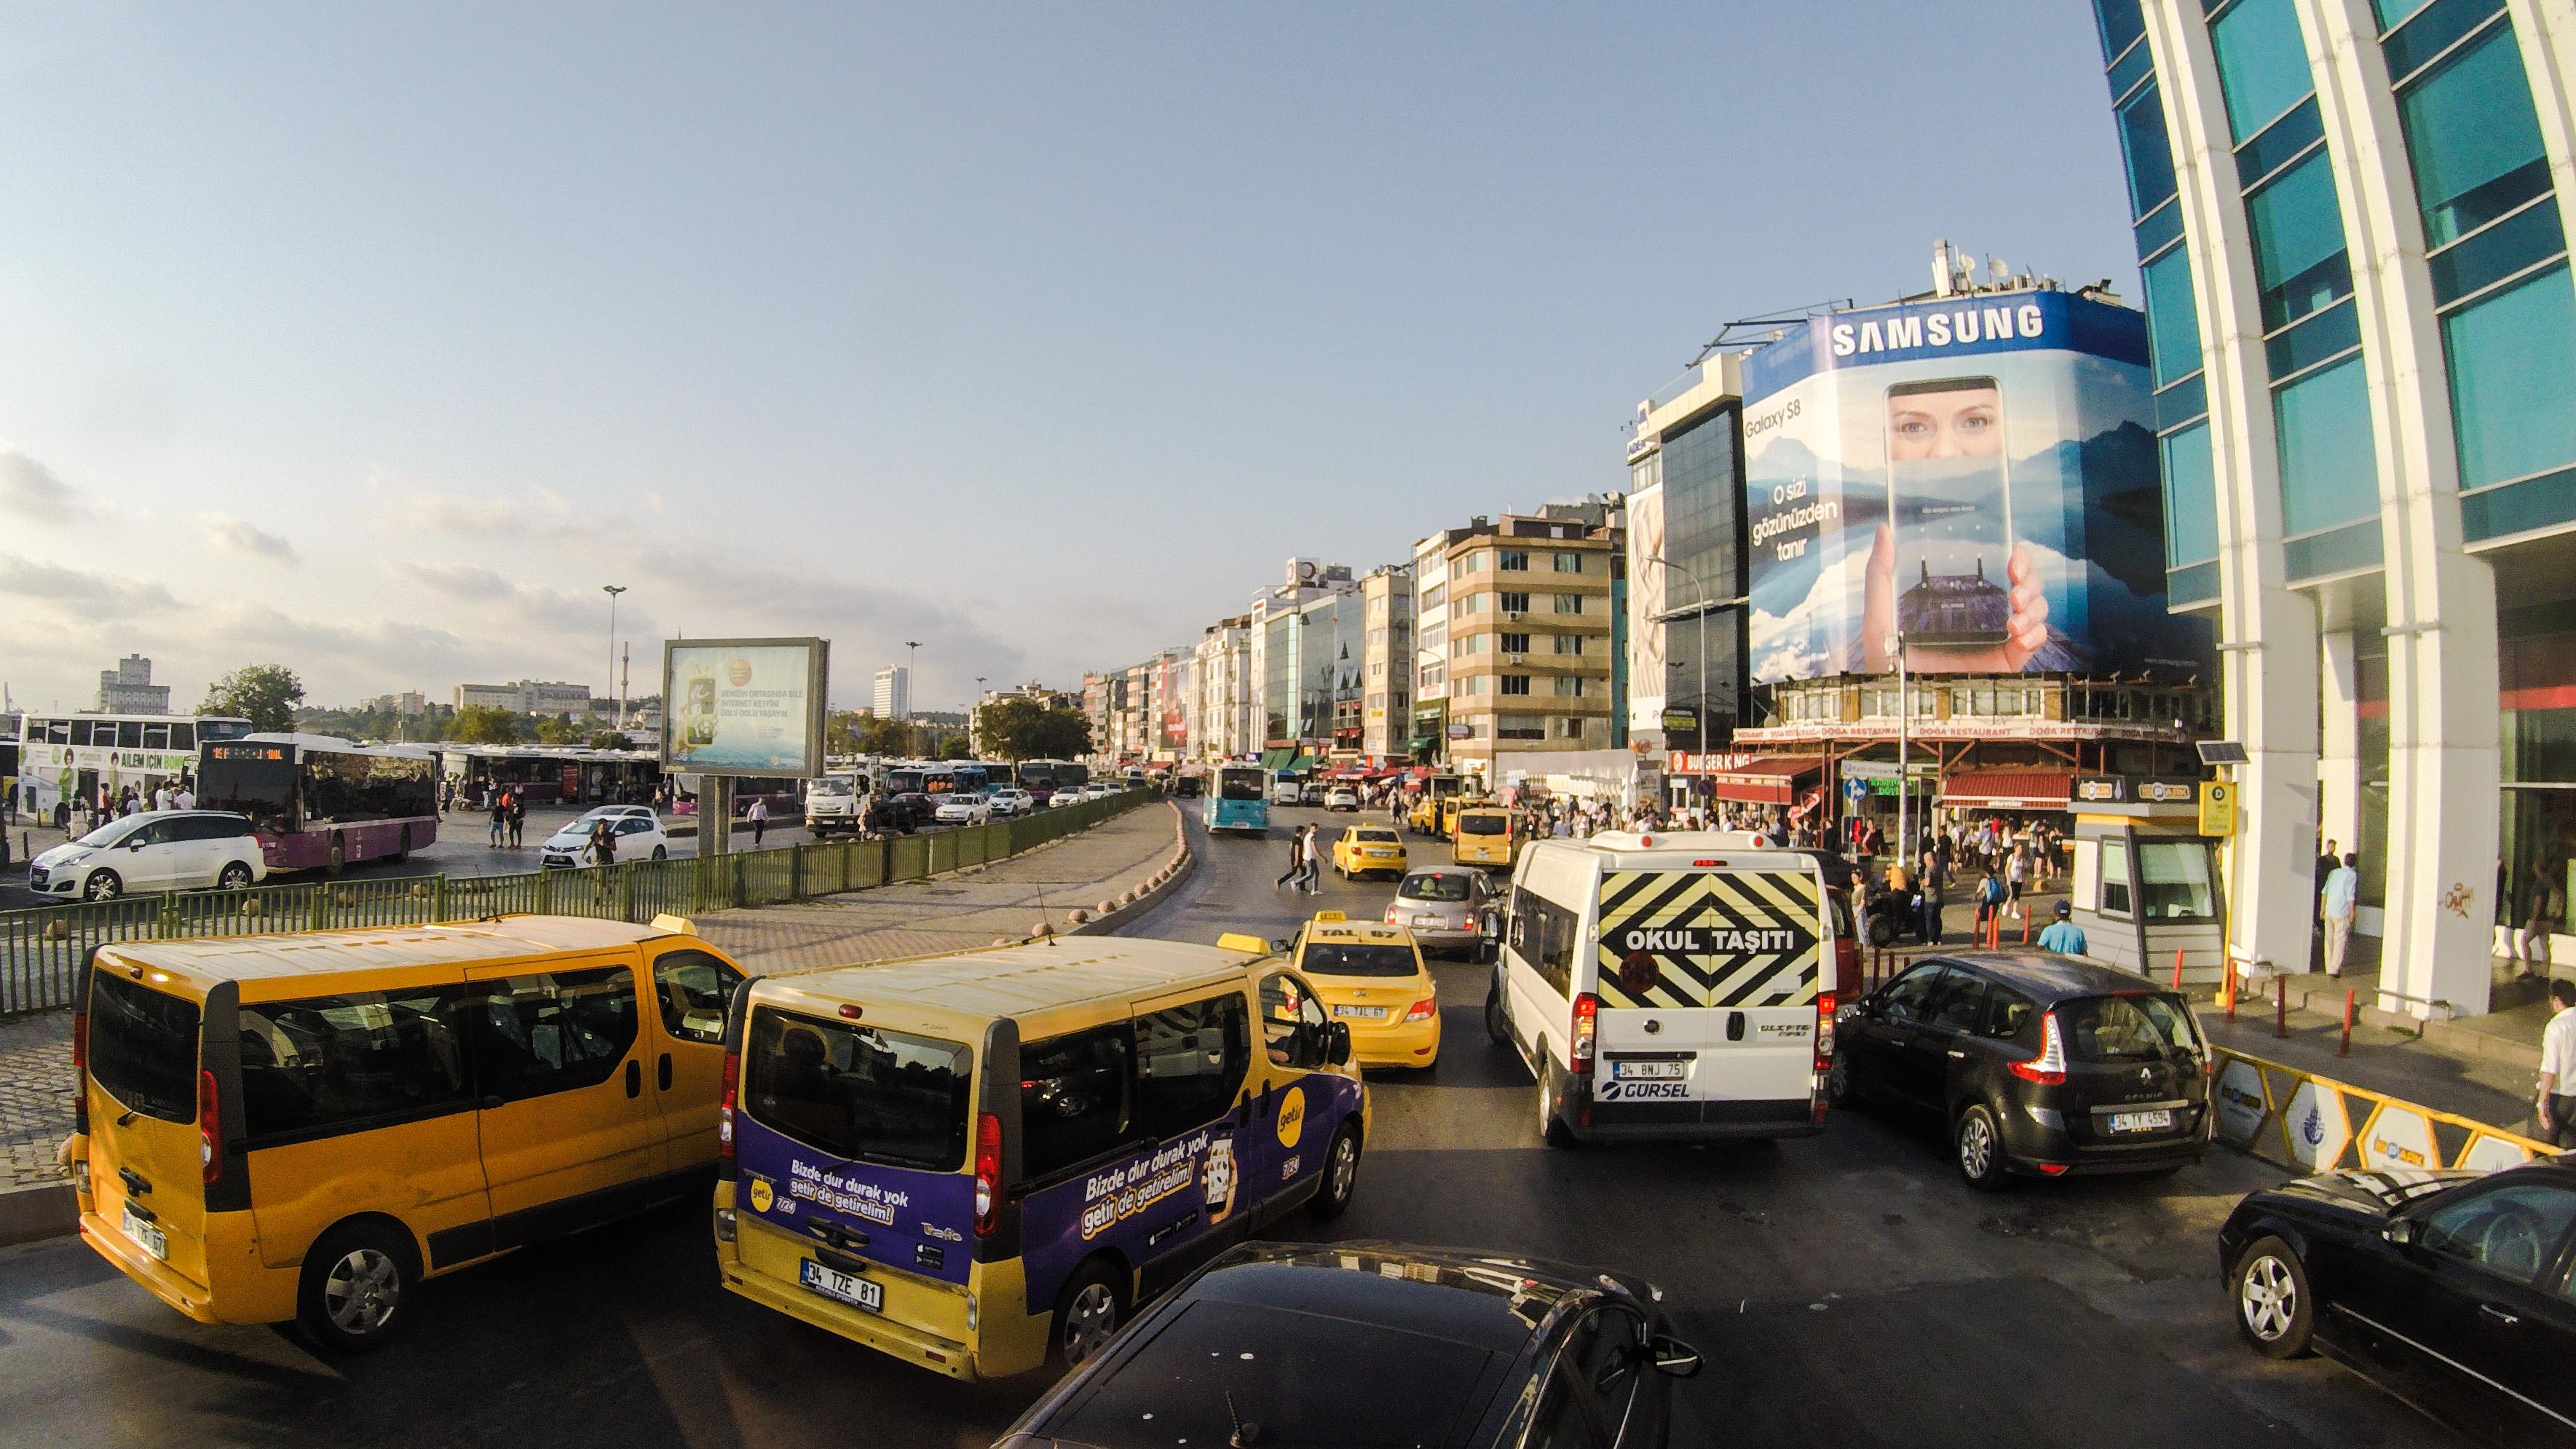 Kate Traveller - Relacja z podróży do Turcji